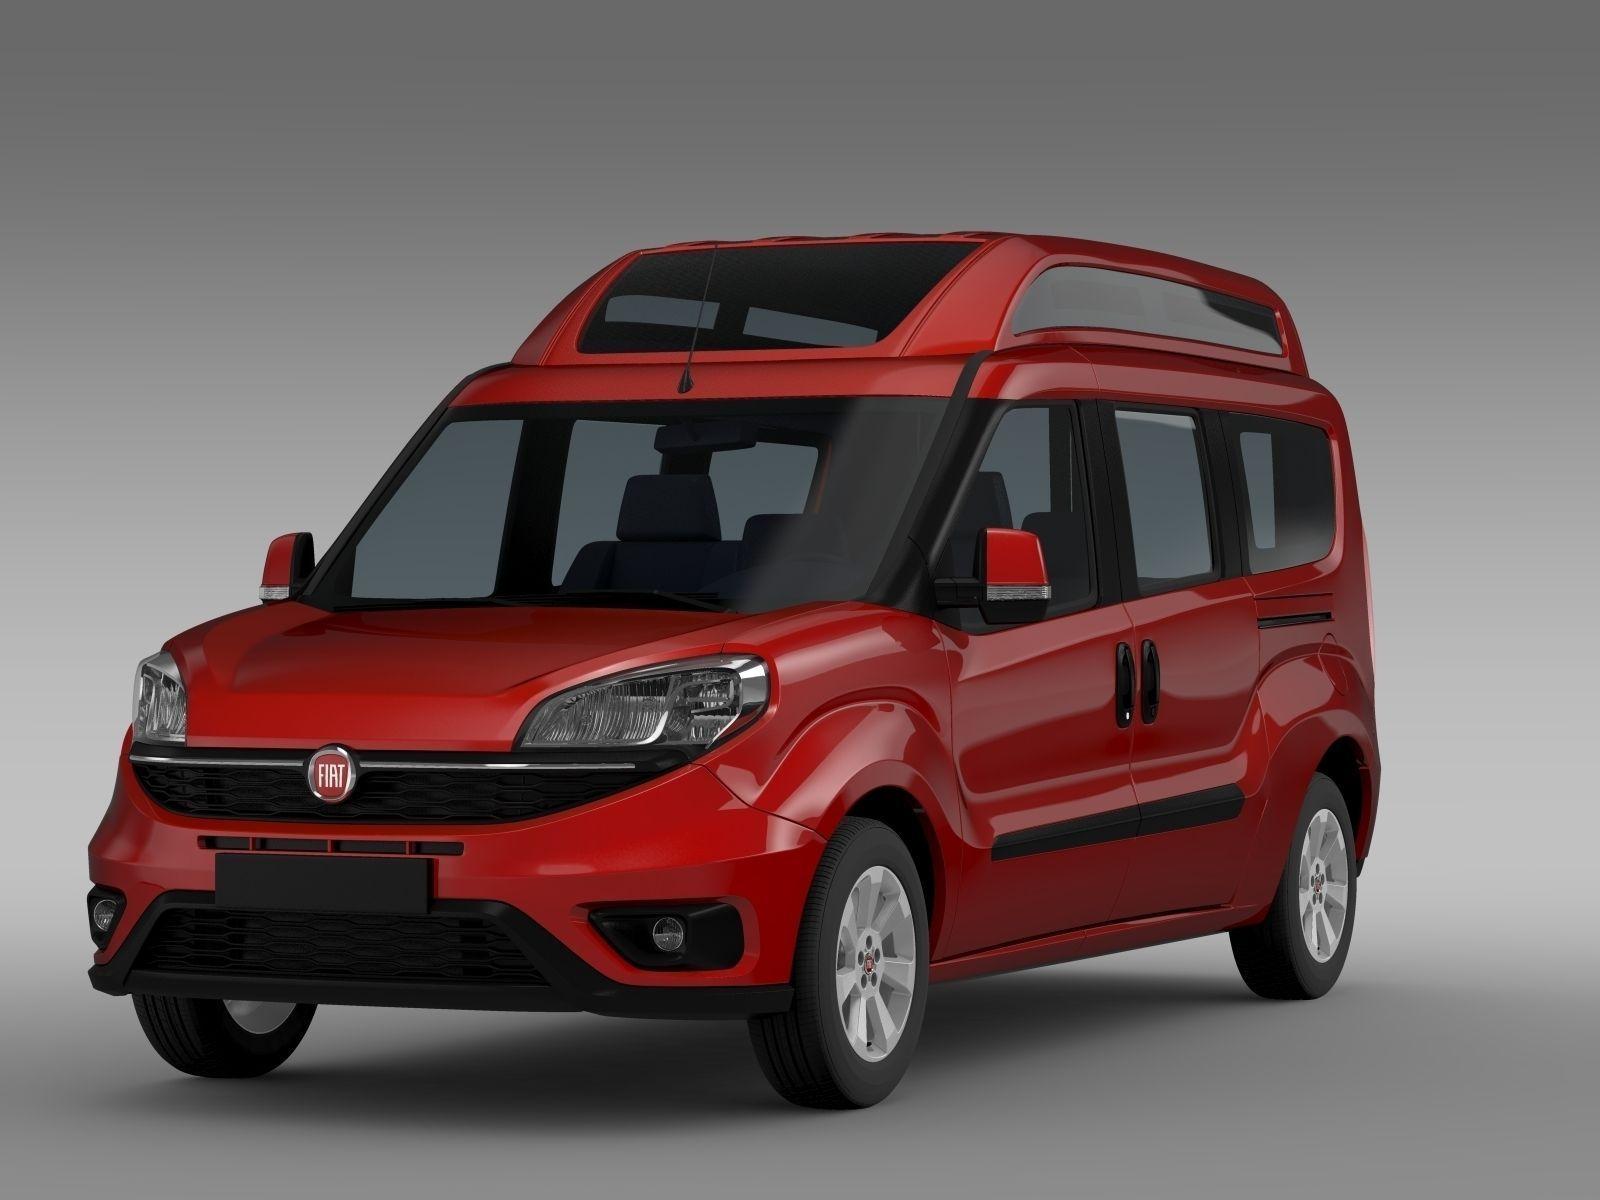 models maxi doblo suv fbx lw lwo model car cgtrader lws max highroof fiat obj